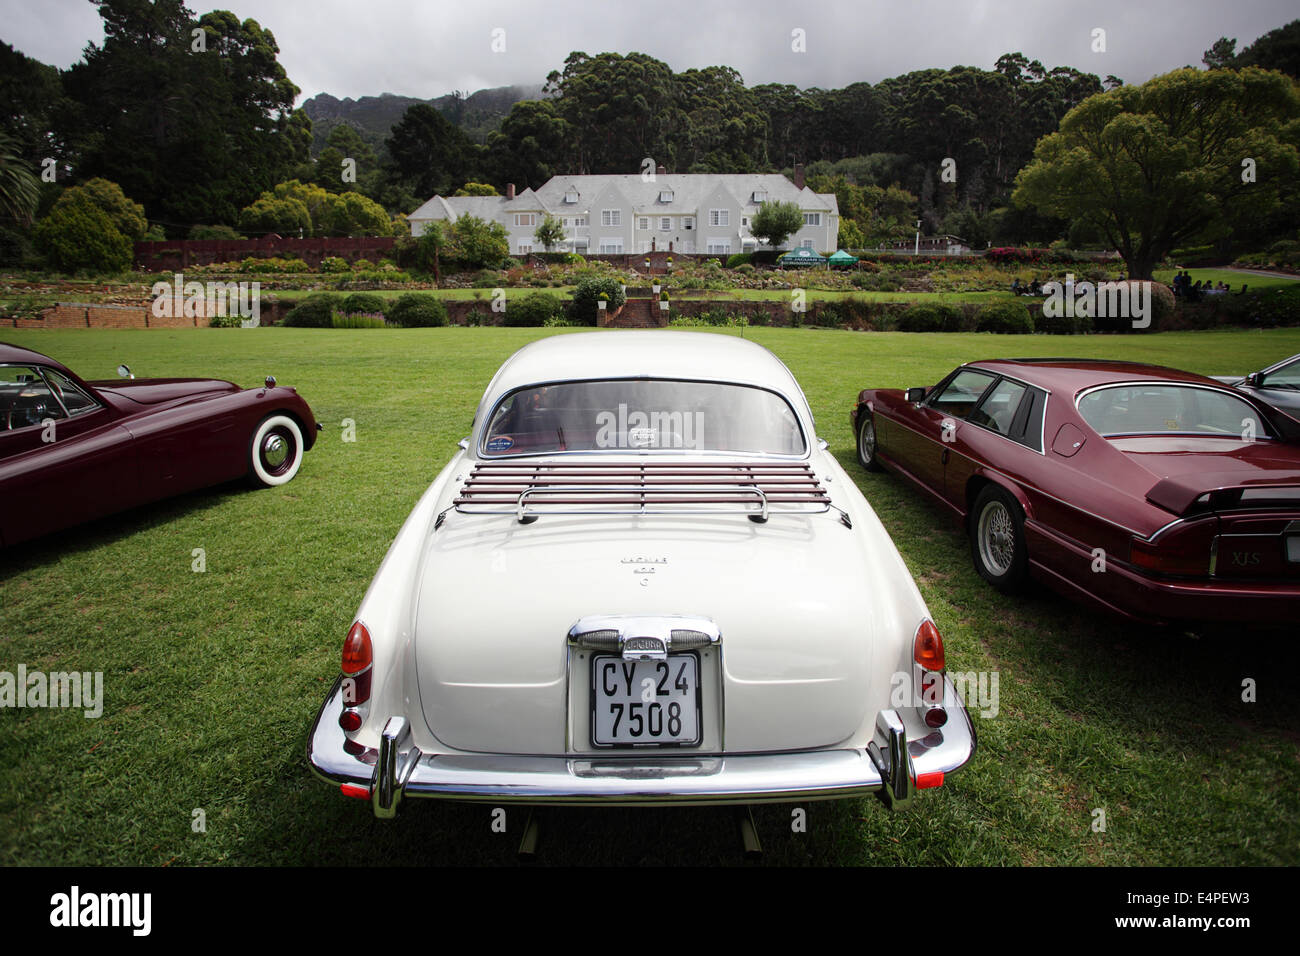 1969 Jaguar E